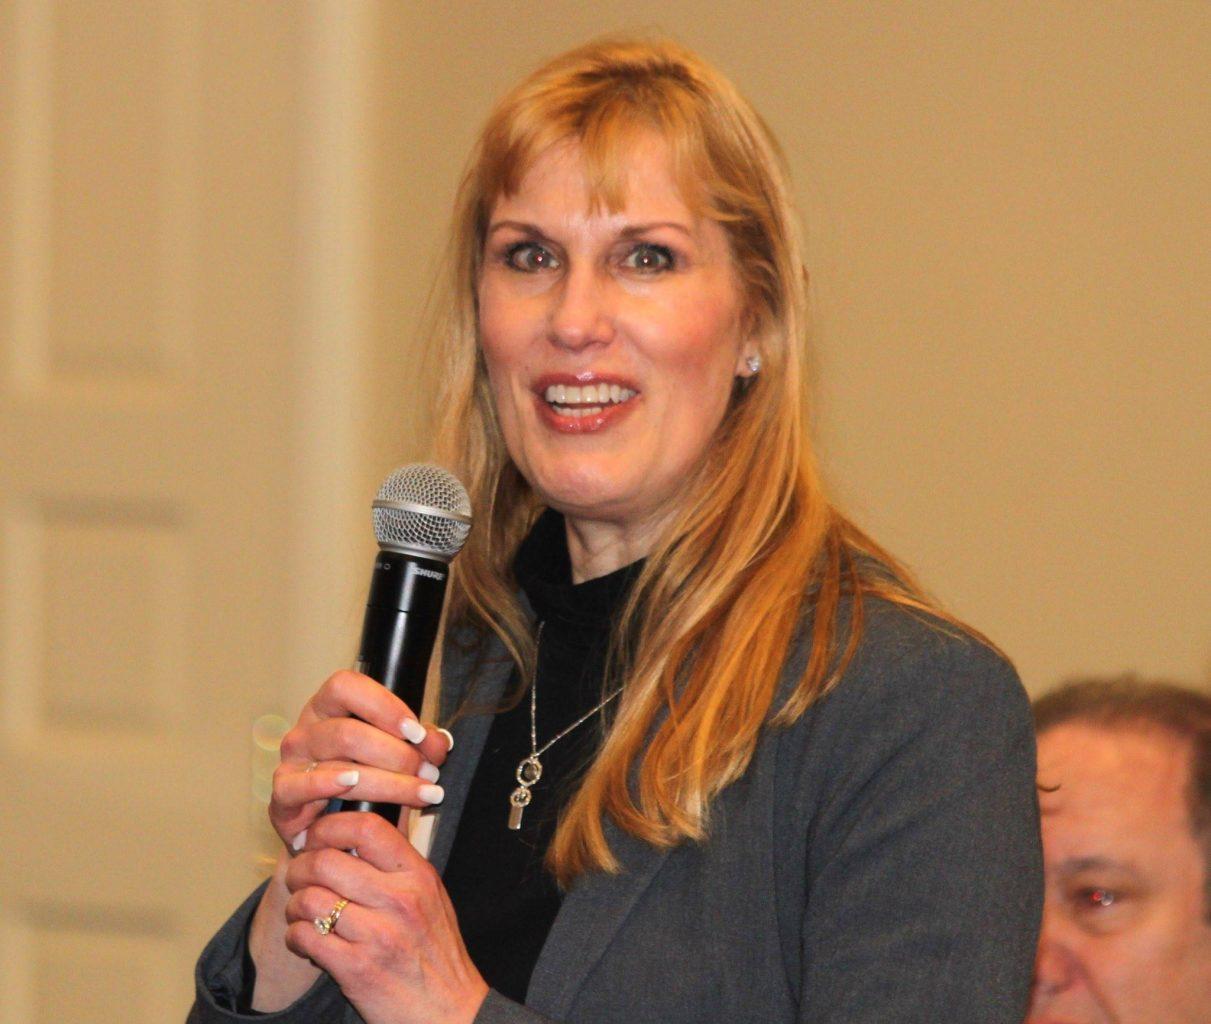 Lisa Radov